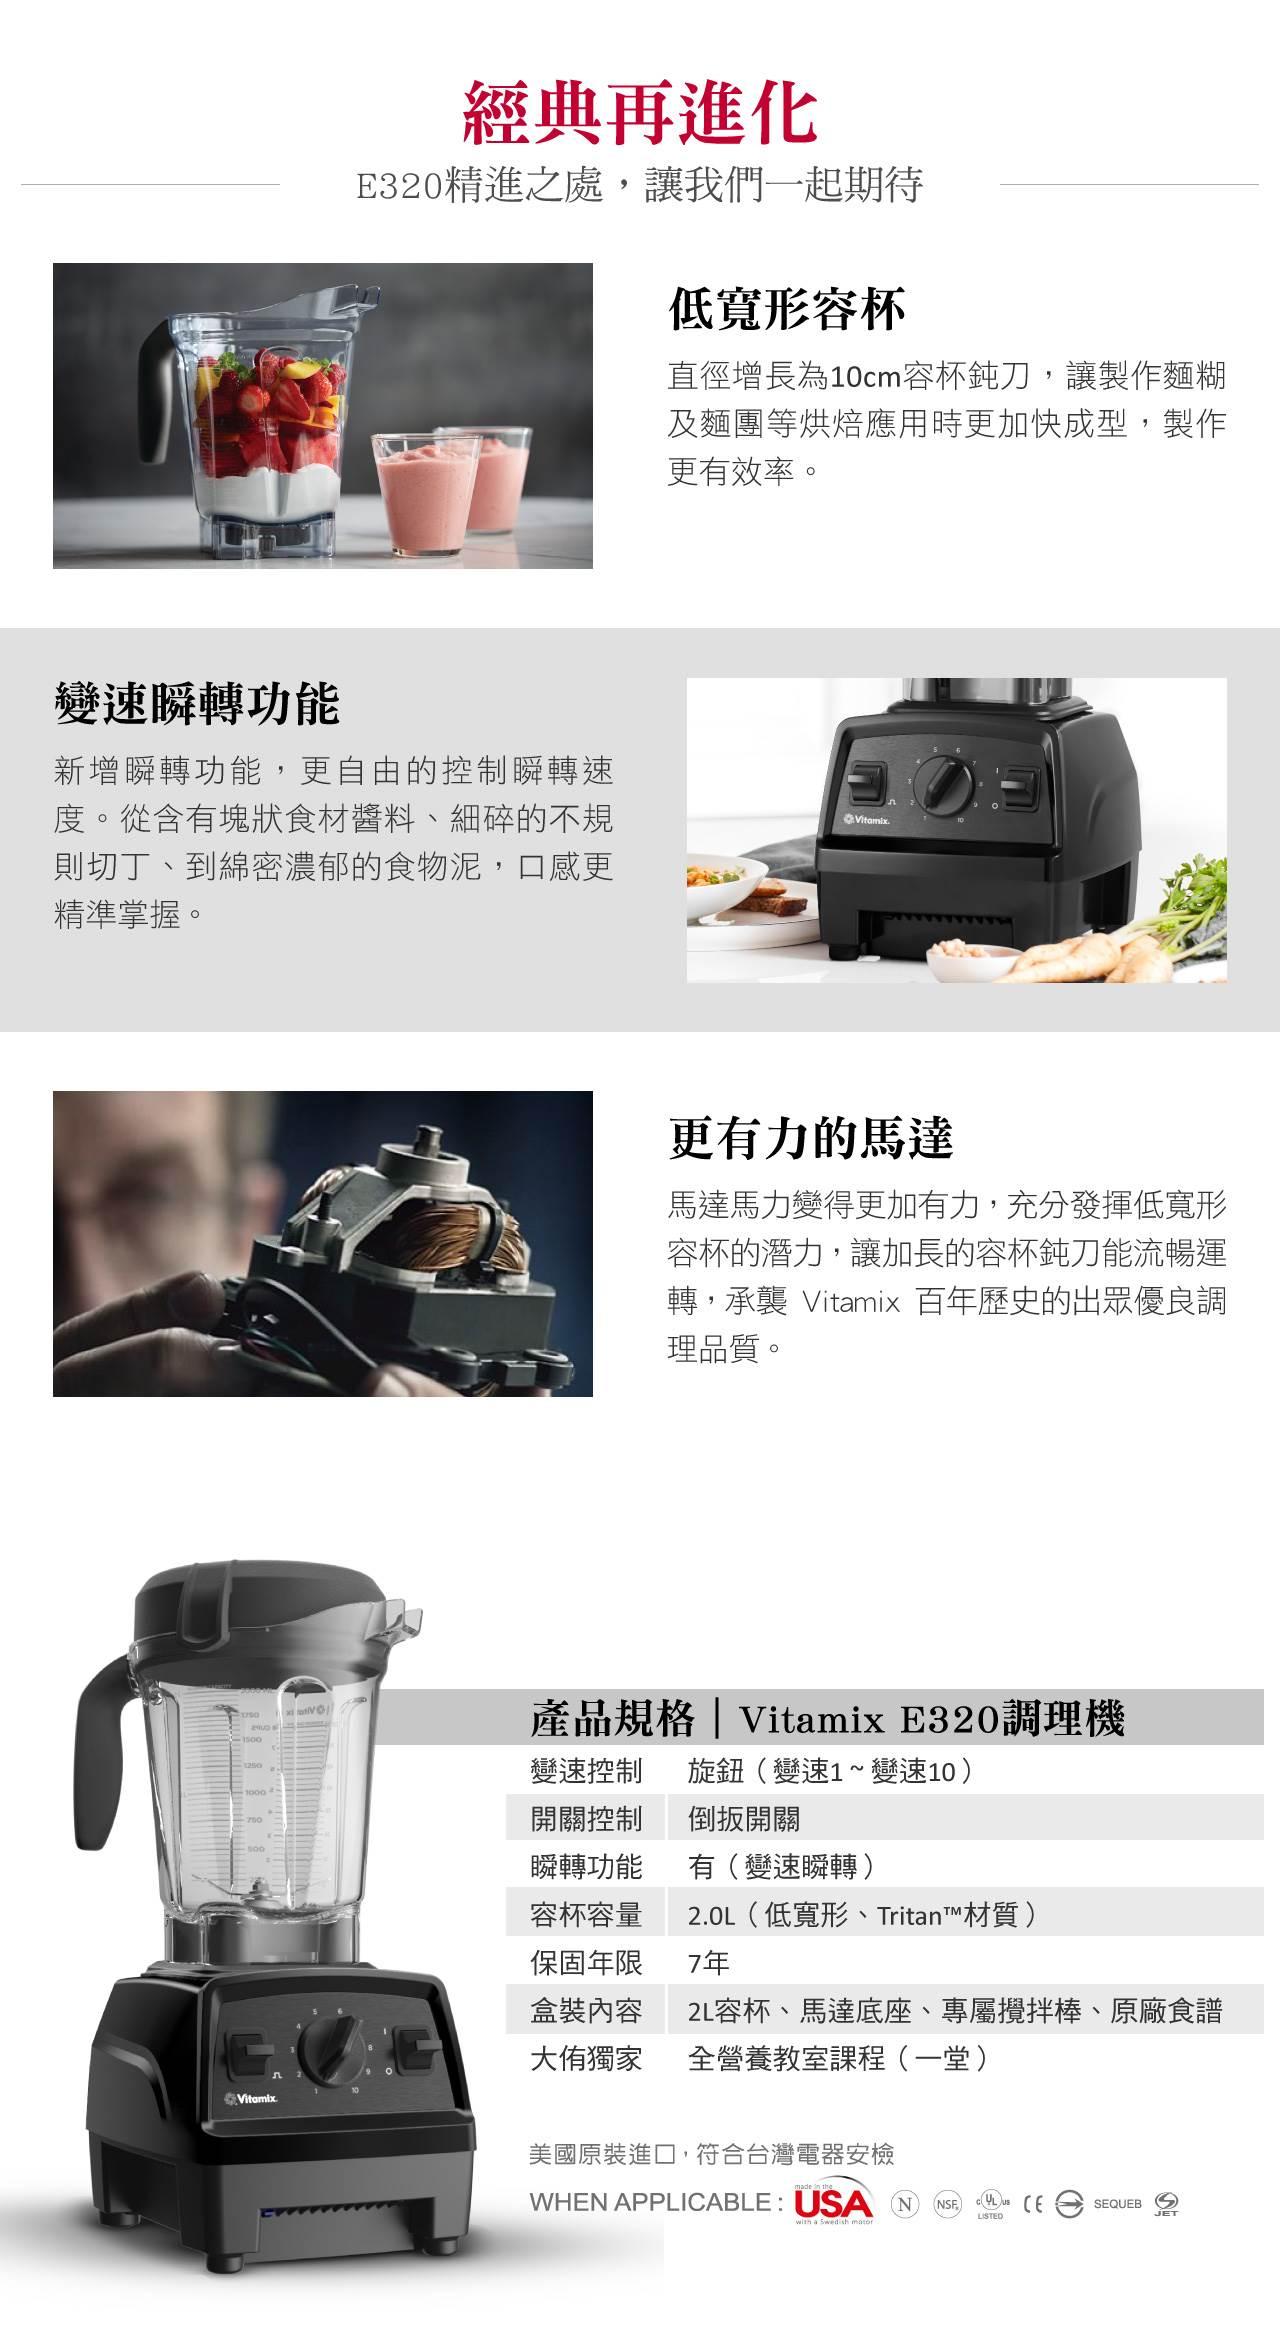 Vitamix-E320調理機-經典再進化與產品規格